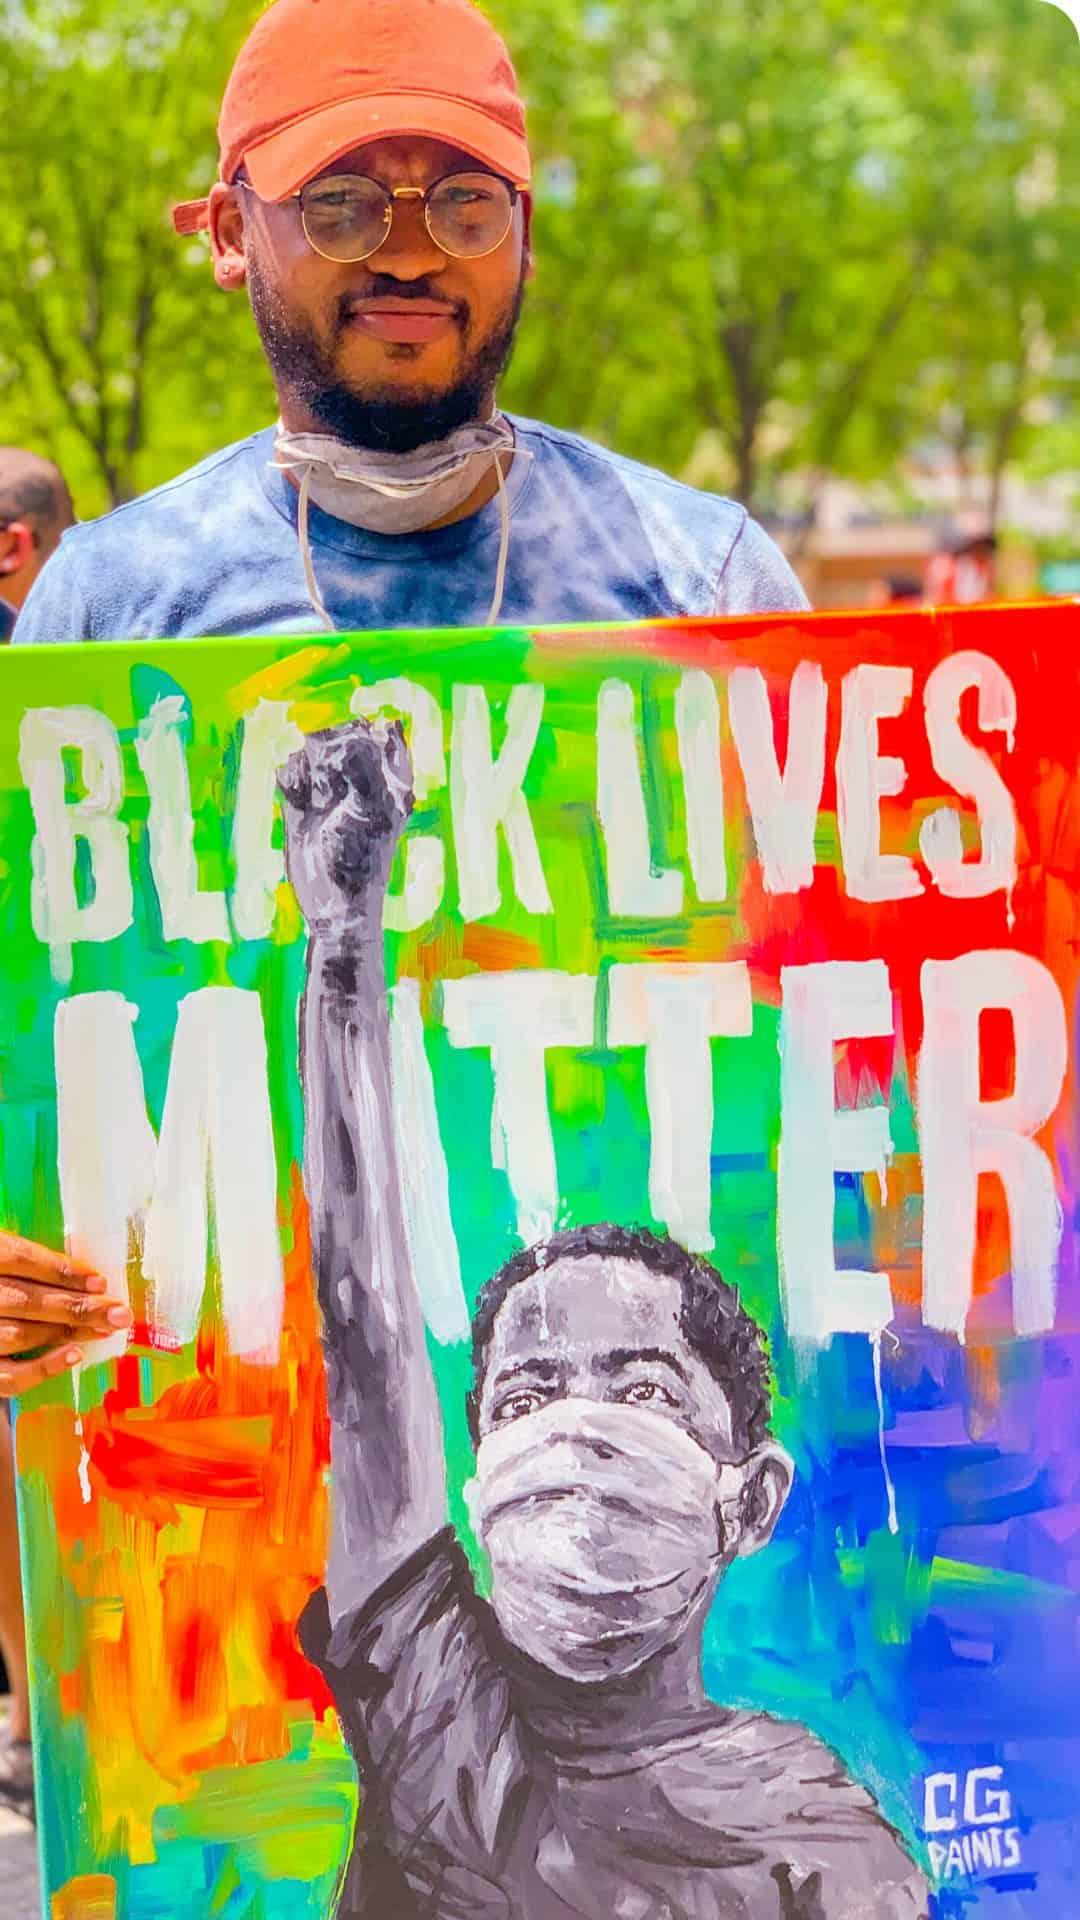 Black Lives Matter inspirational art